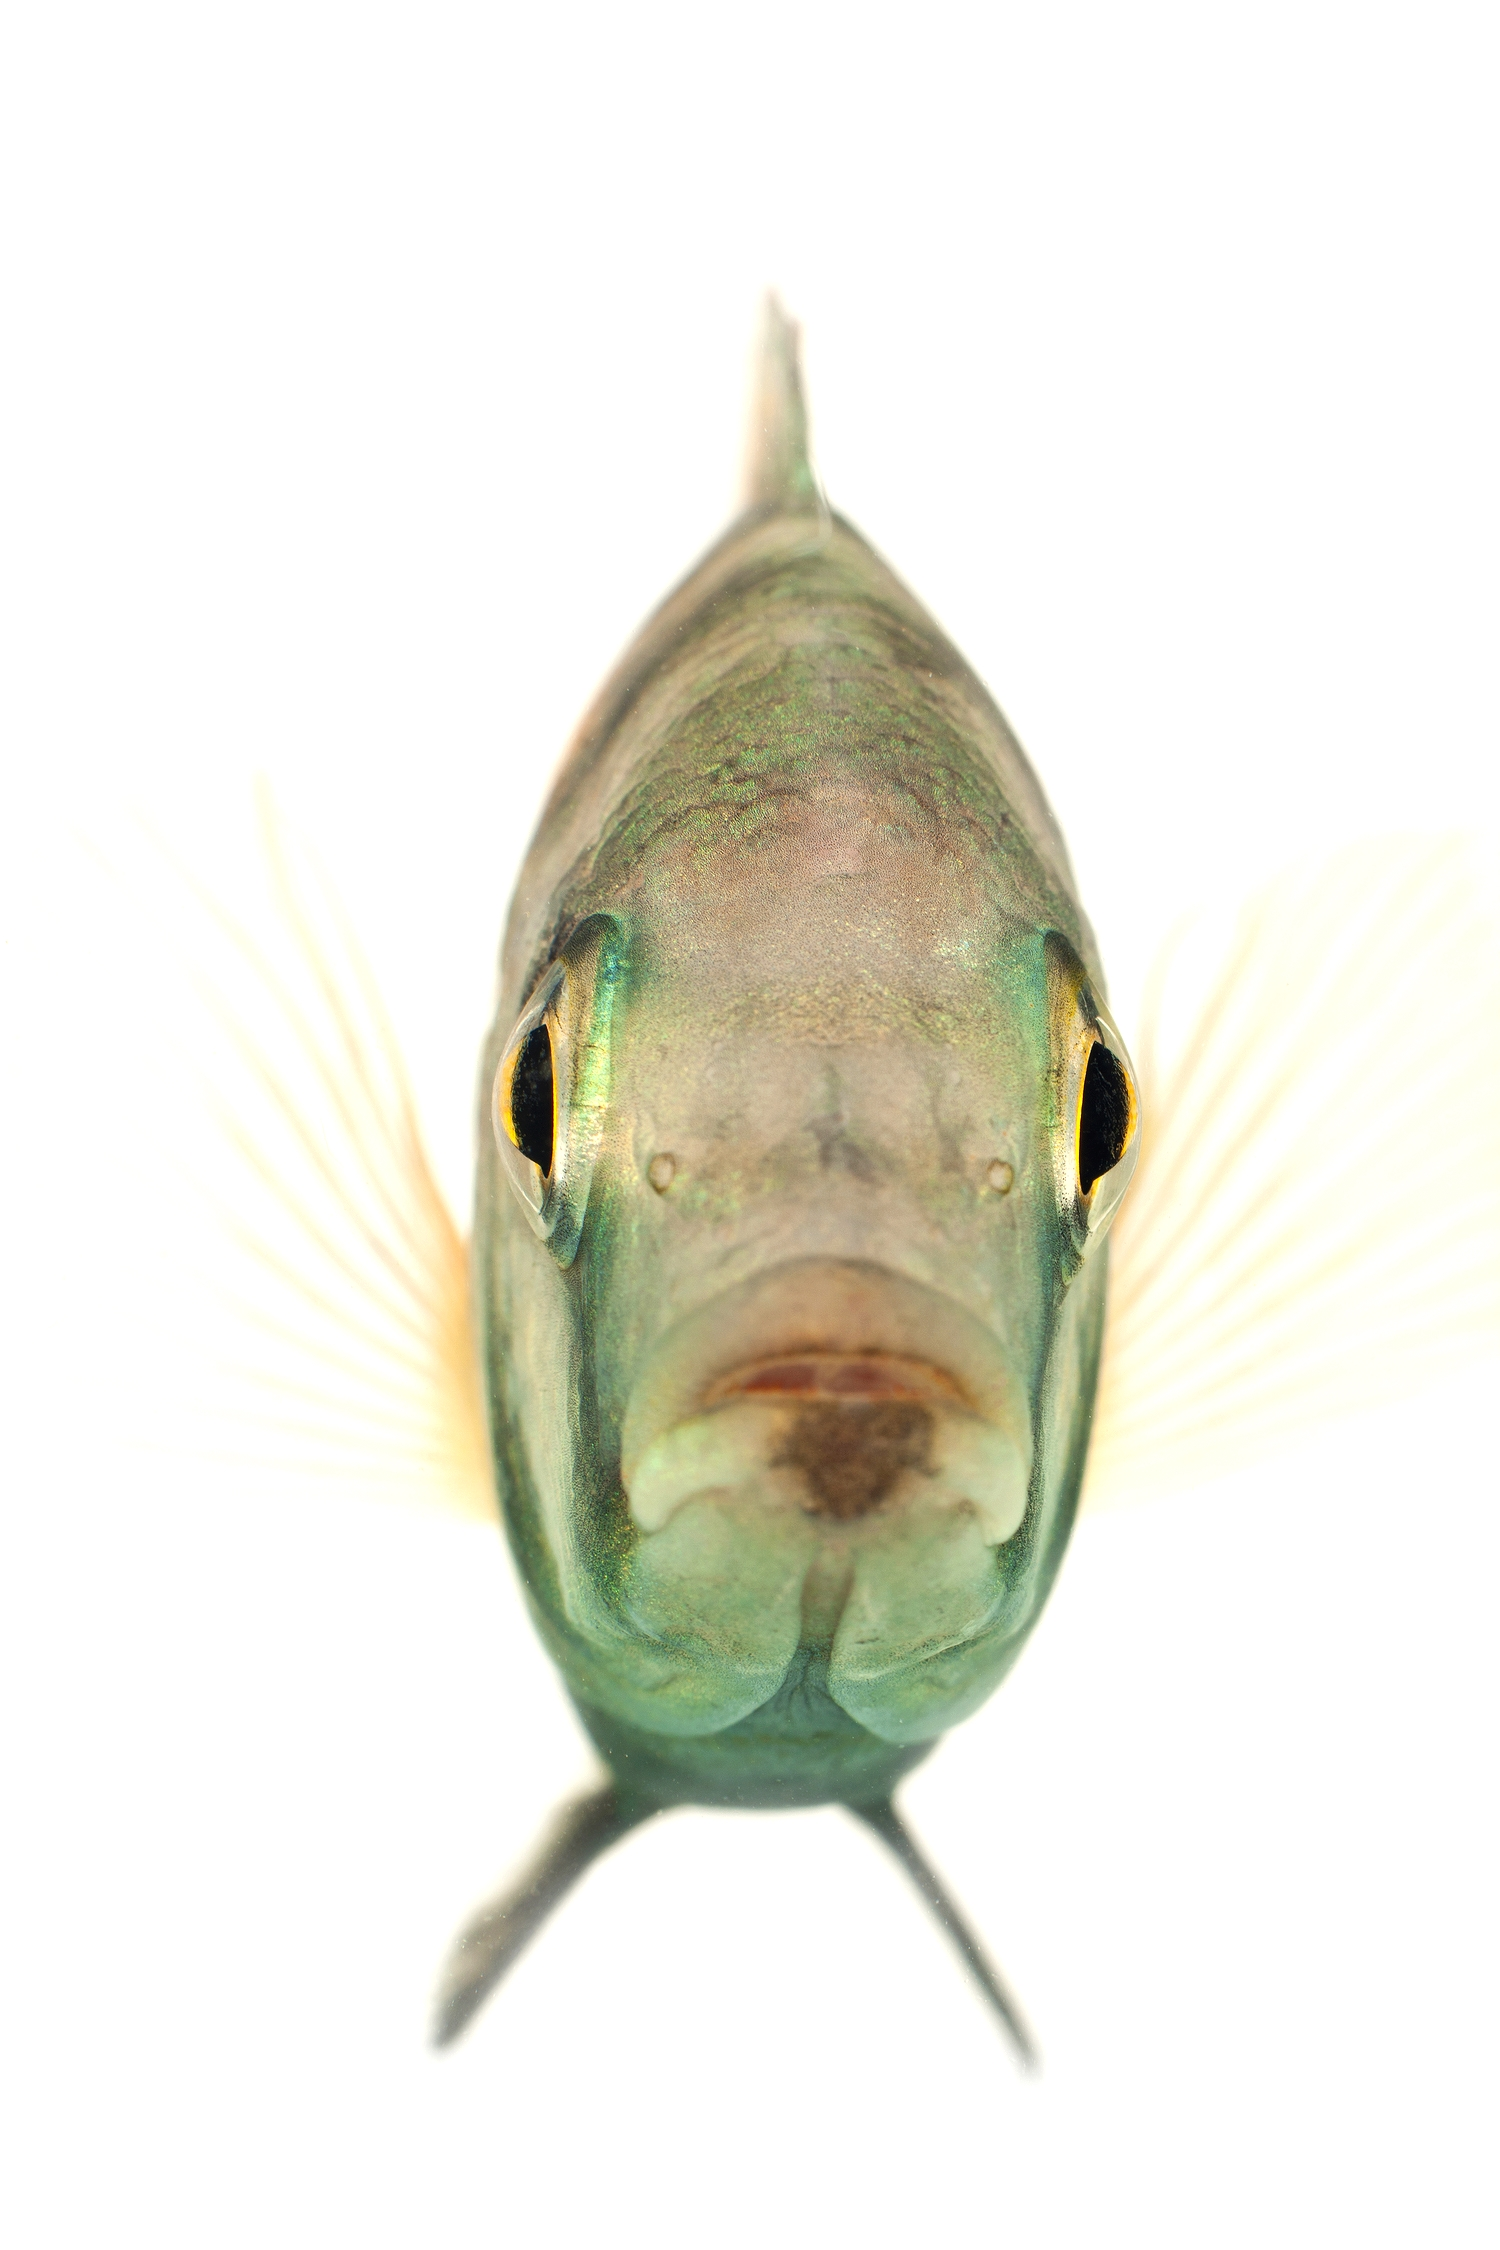 African Cichlid - Malawi Haplochromis